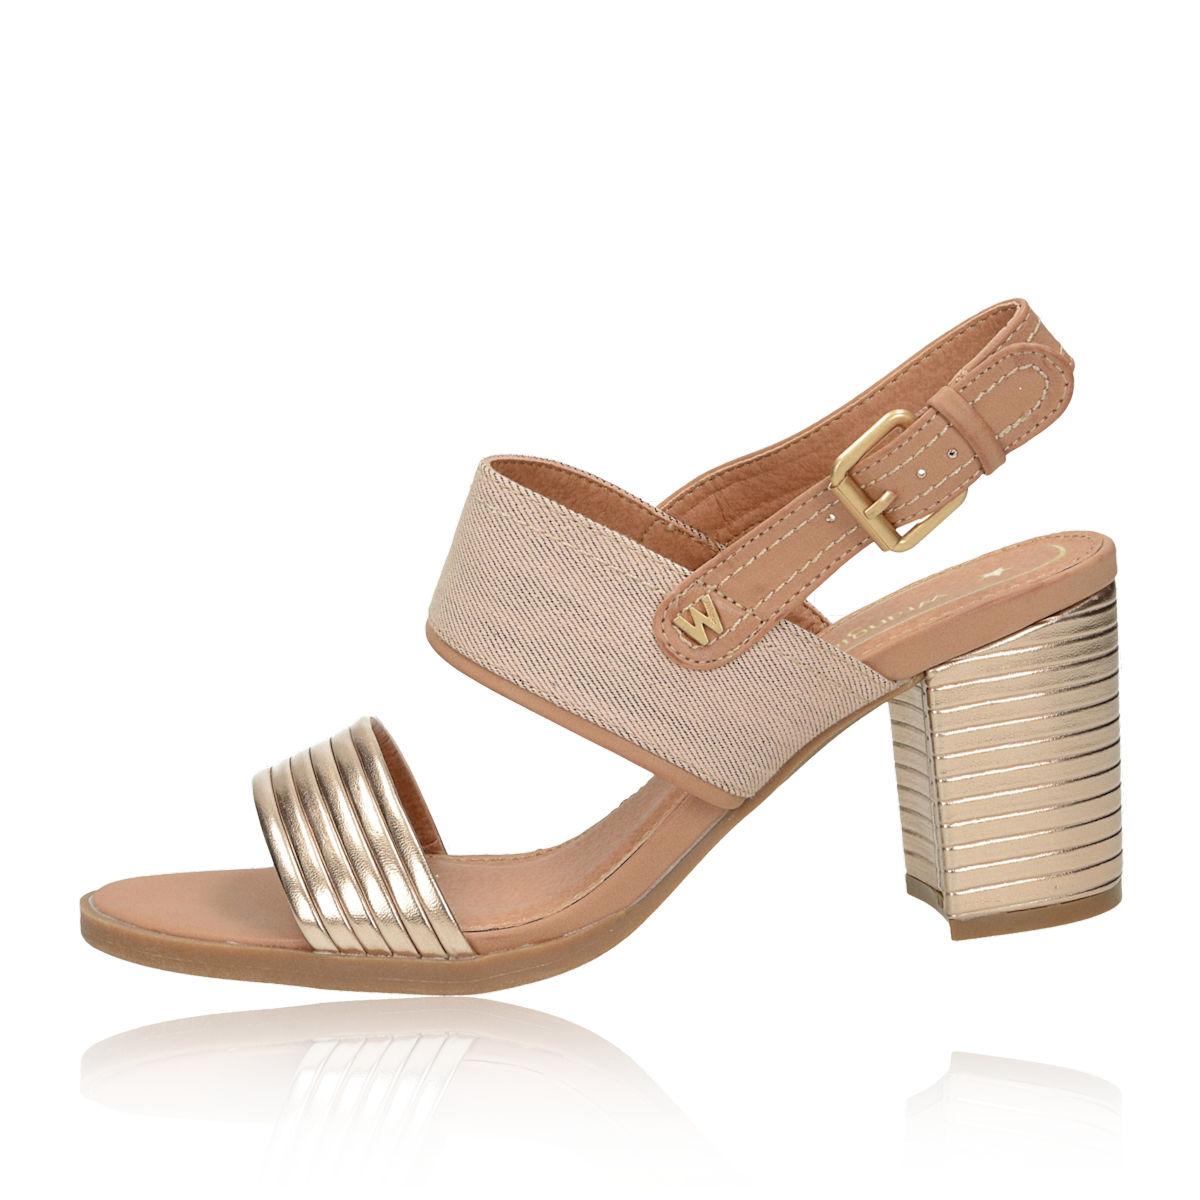 afc2808dd527 Wrangler dámske štýlové sandále - béžové Wrangler dámske štýlové sandále -  béžové ...